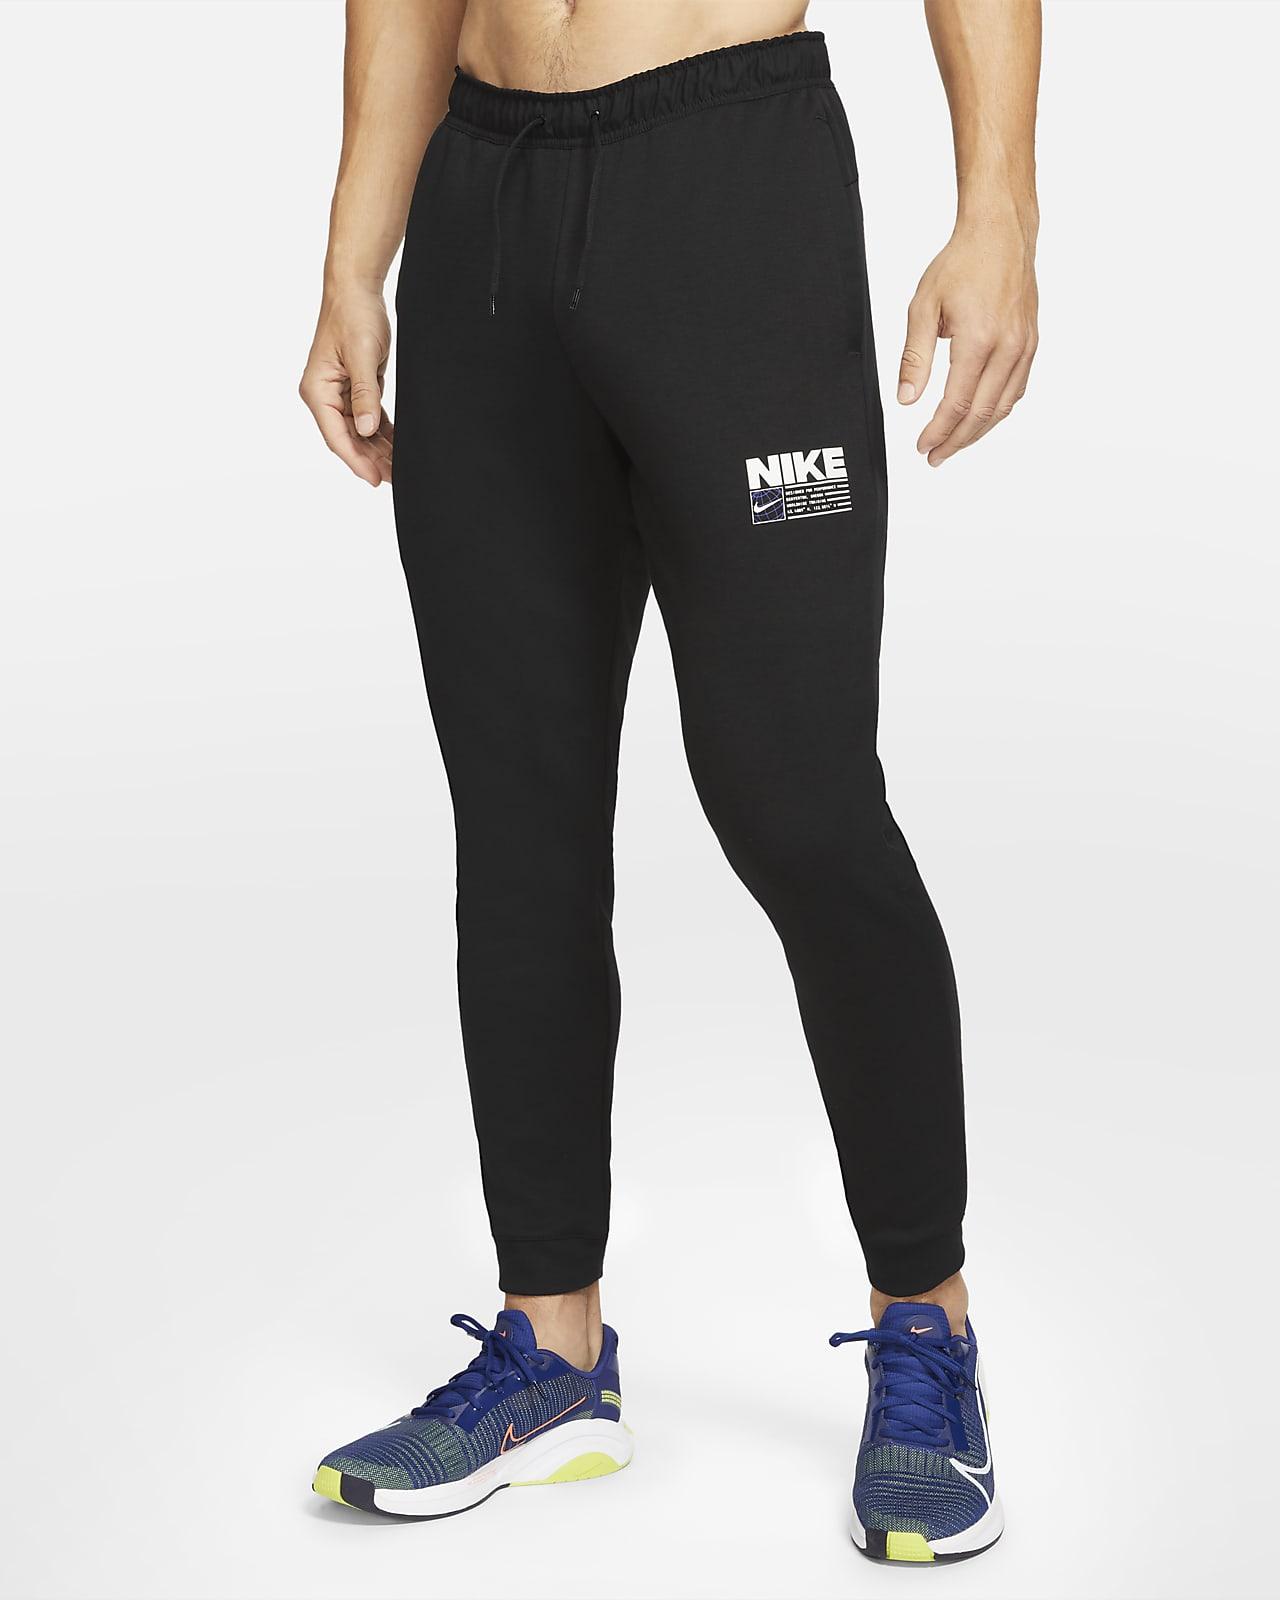 Pantaloni da training affusolati Nike Dri-FIT - Uomo